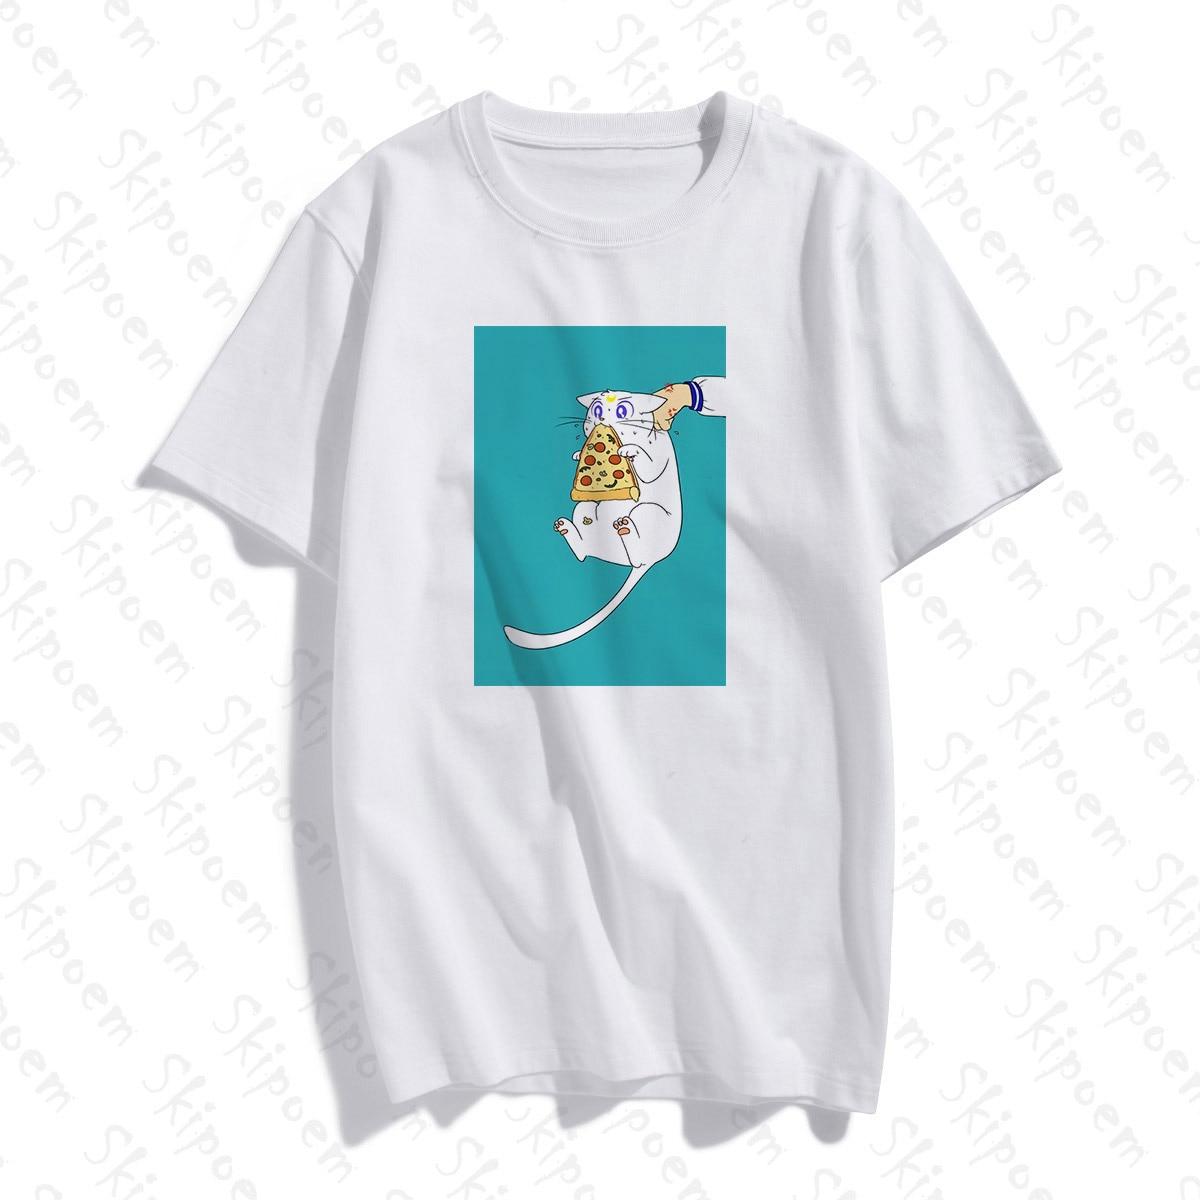 Bonito marinheiro lua tshirt feminino estético punk estilo coreano do vintage kawaii algodão plus size manga curta camiseta femme topo t